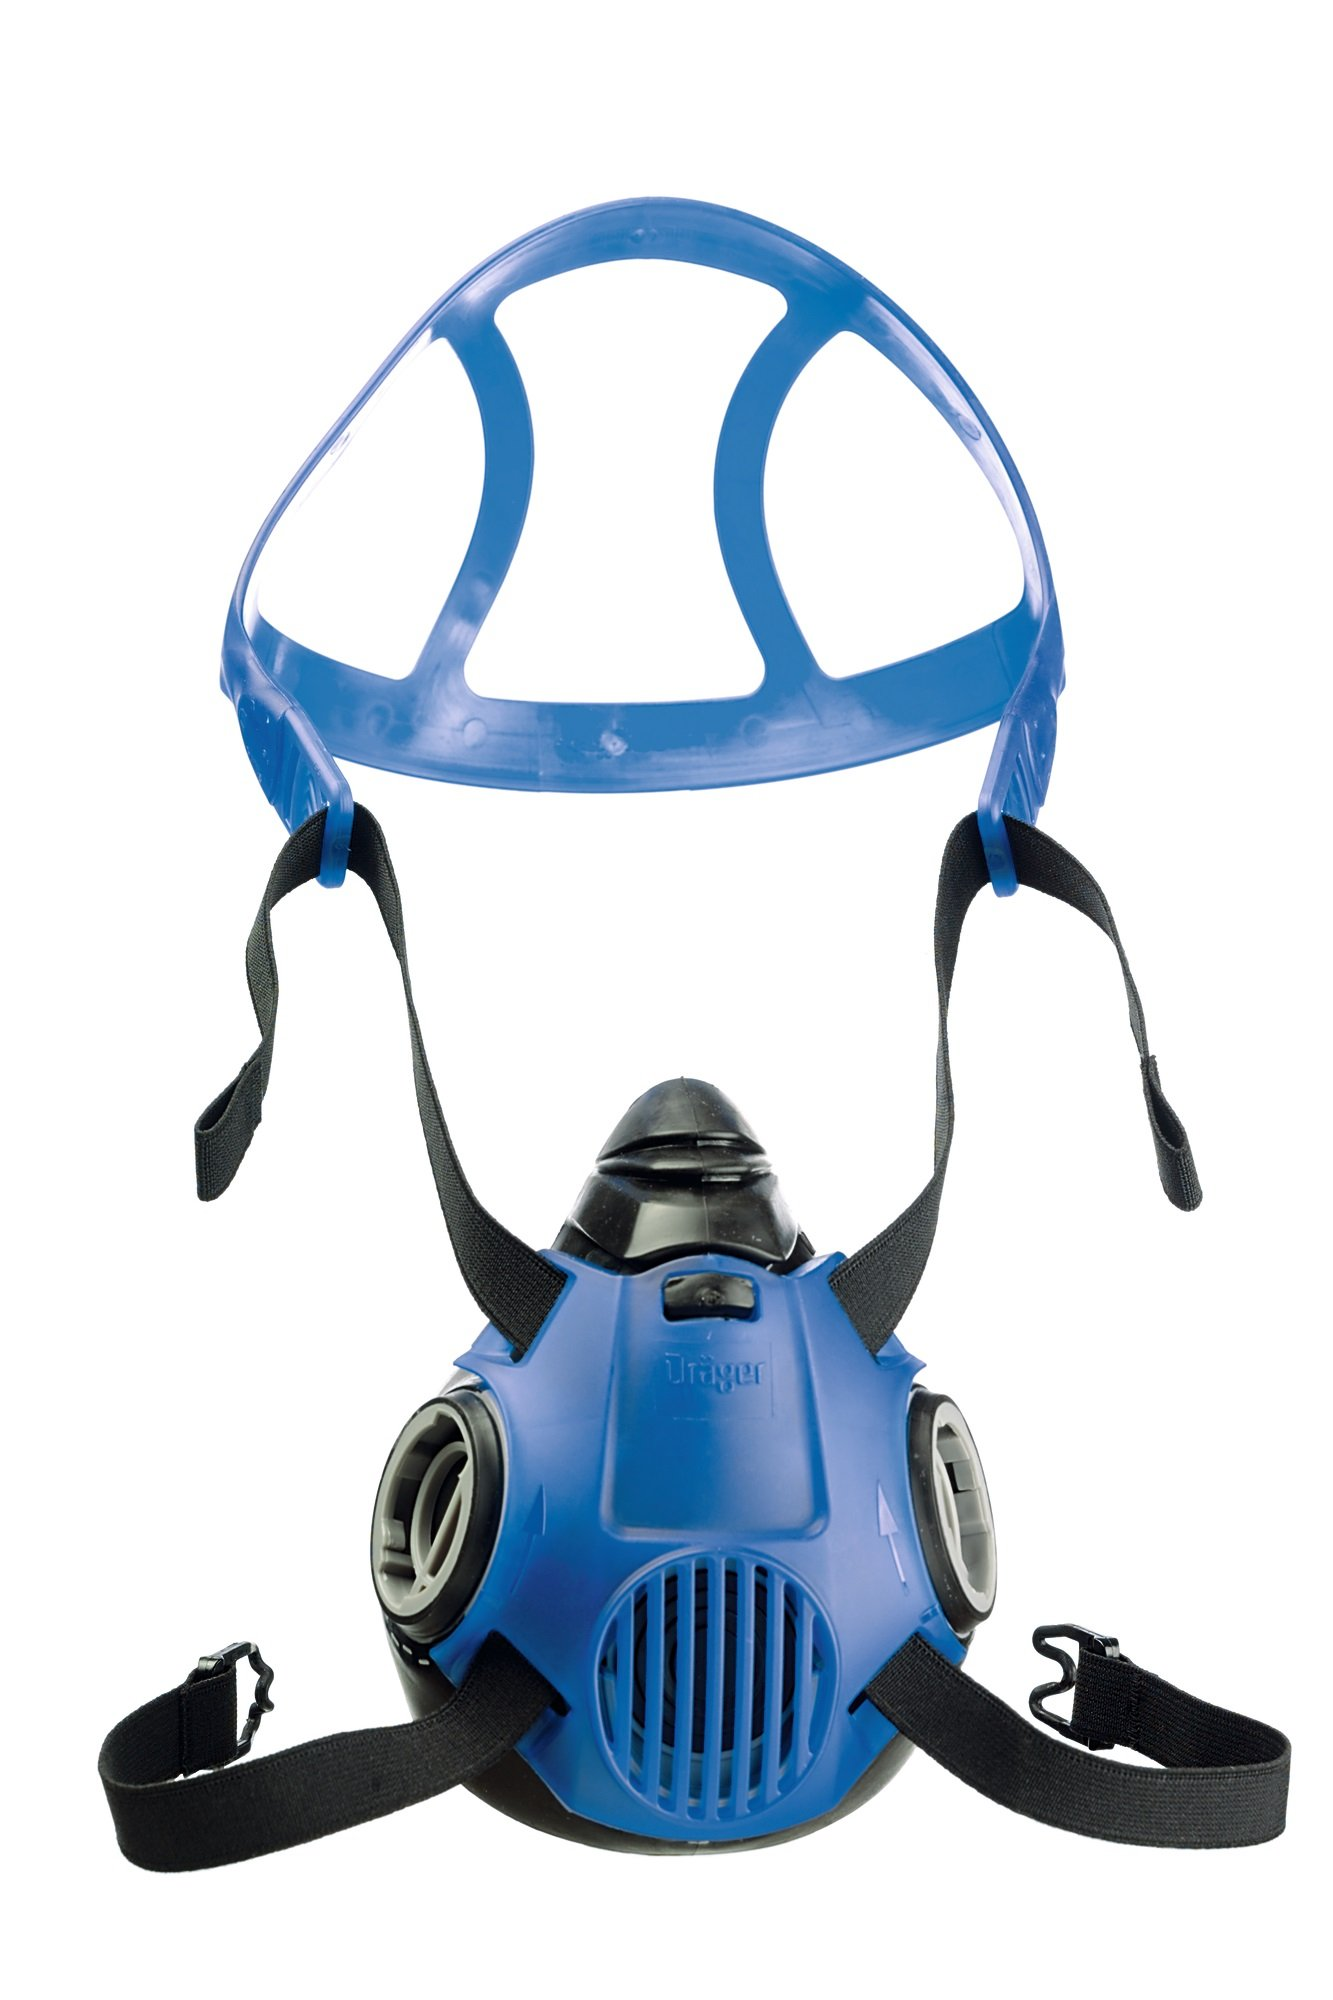 Dräger X-plore 3500 respirator mask | Size L | long-duration and reusable half face mask | NIOSH-approved